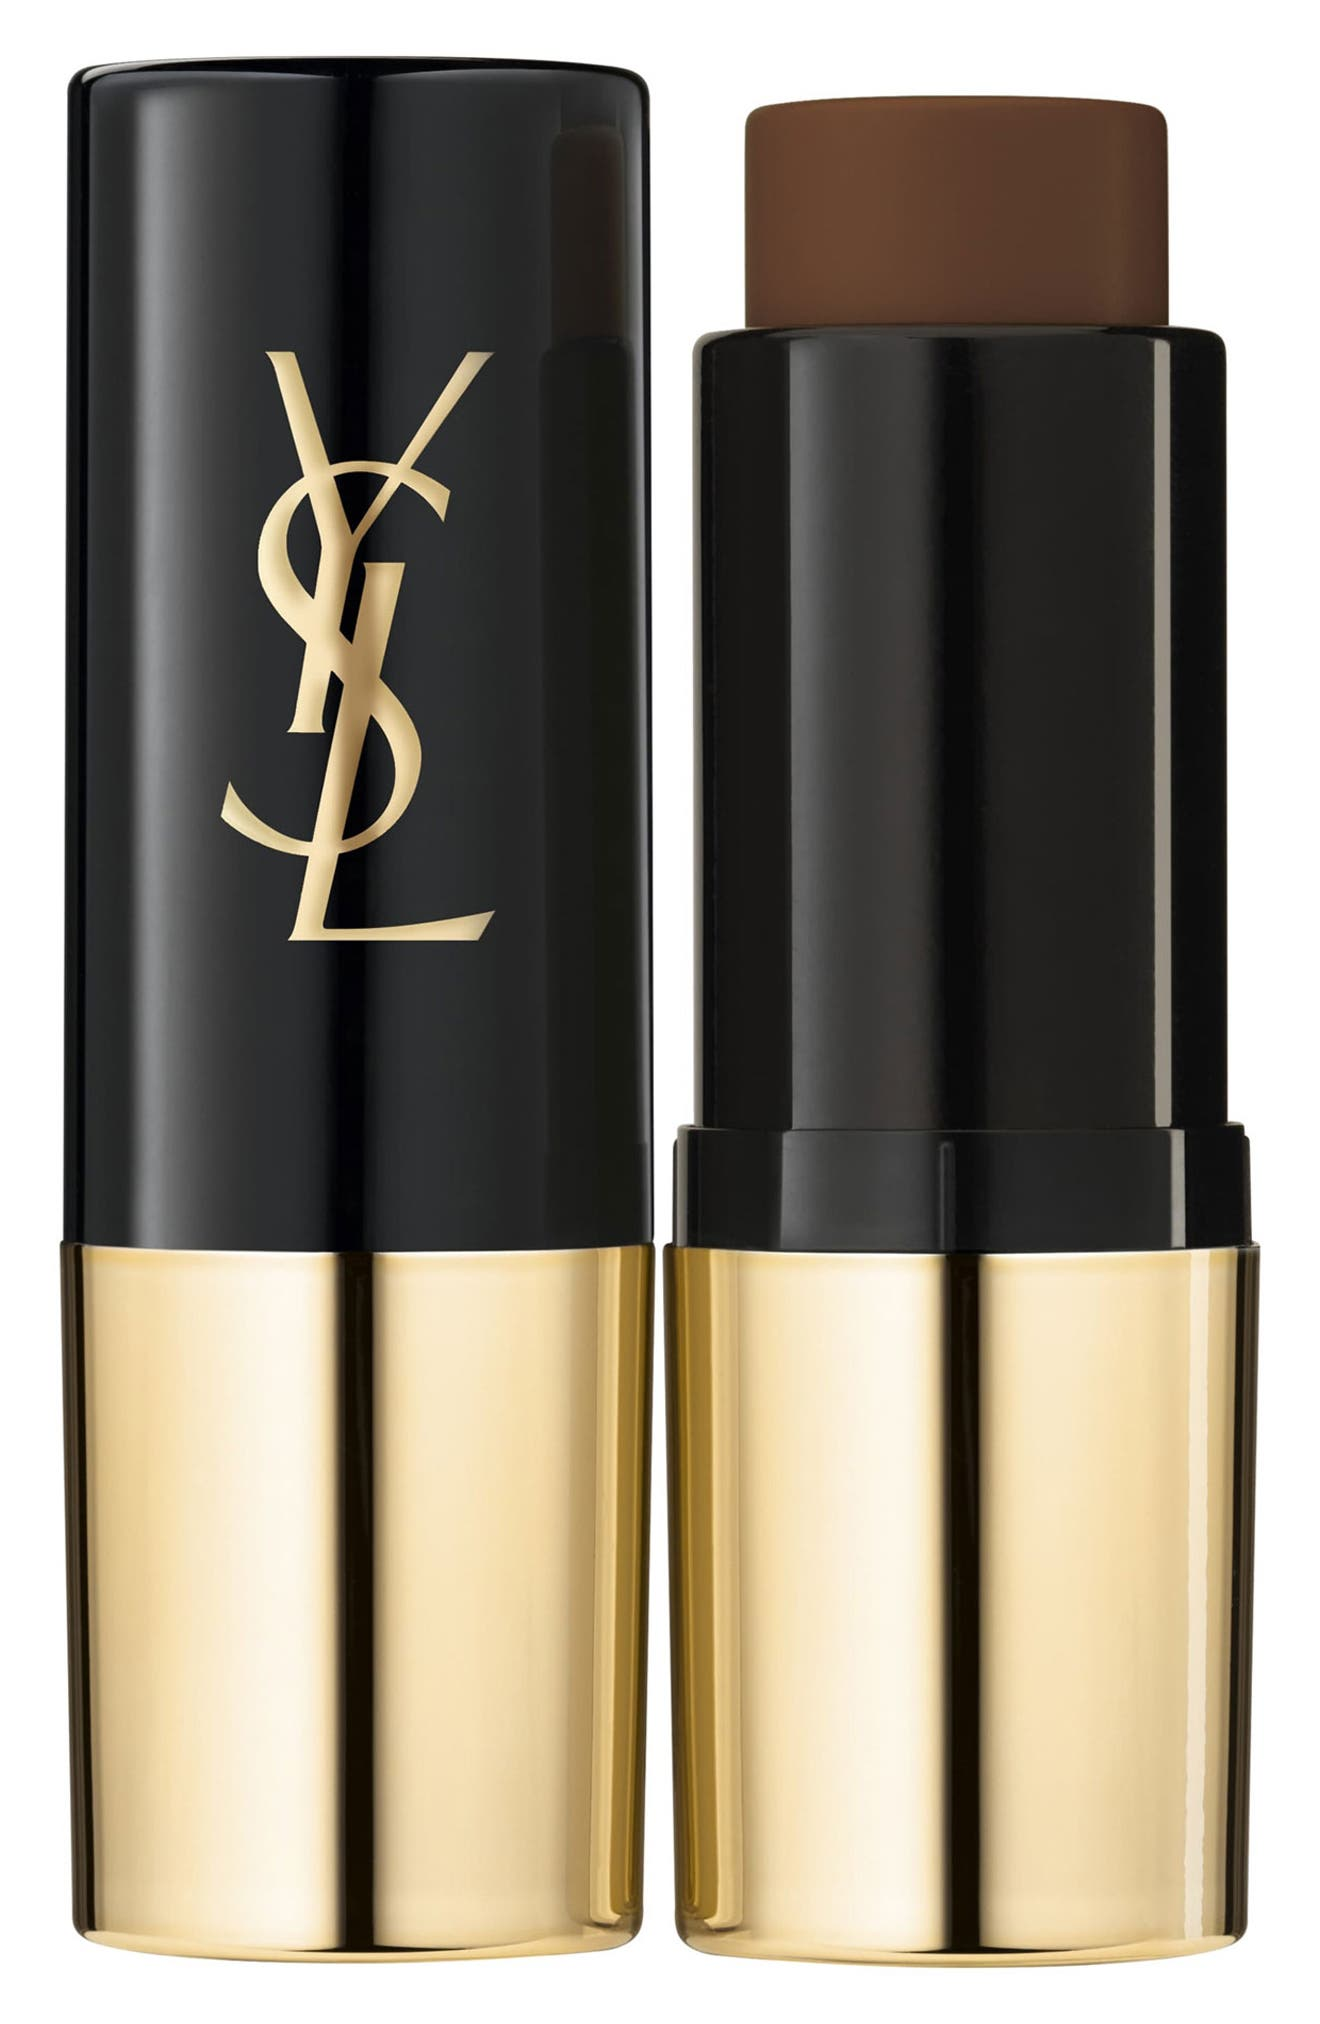 Yves Saint Laurent All Hours Foundation Stick - B90 Ebony